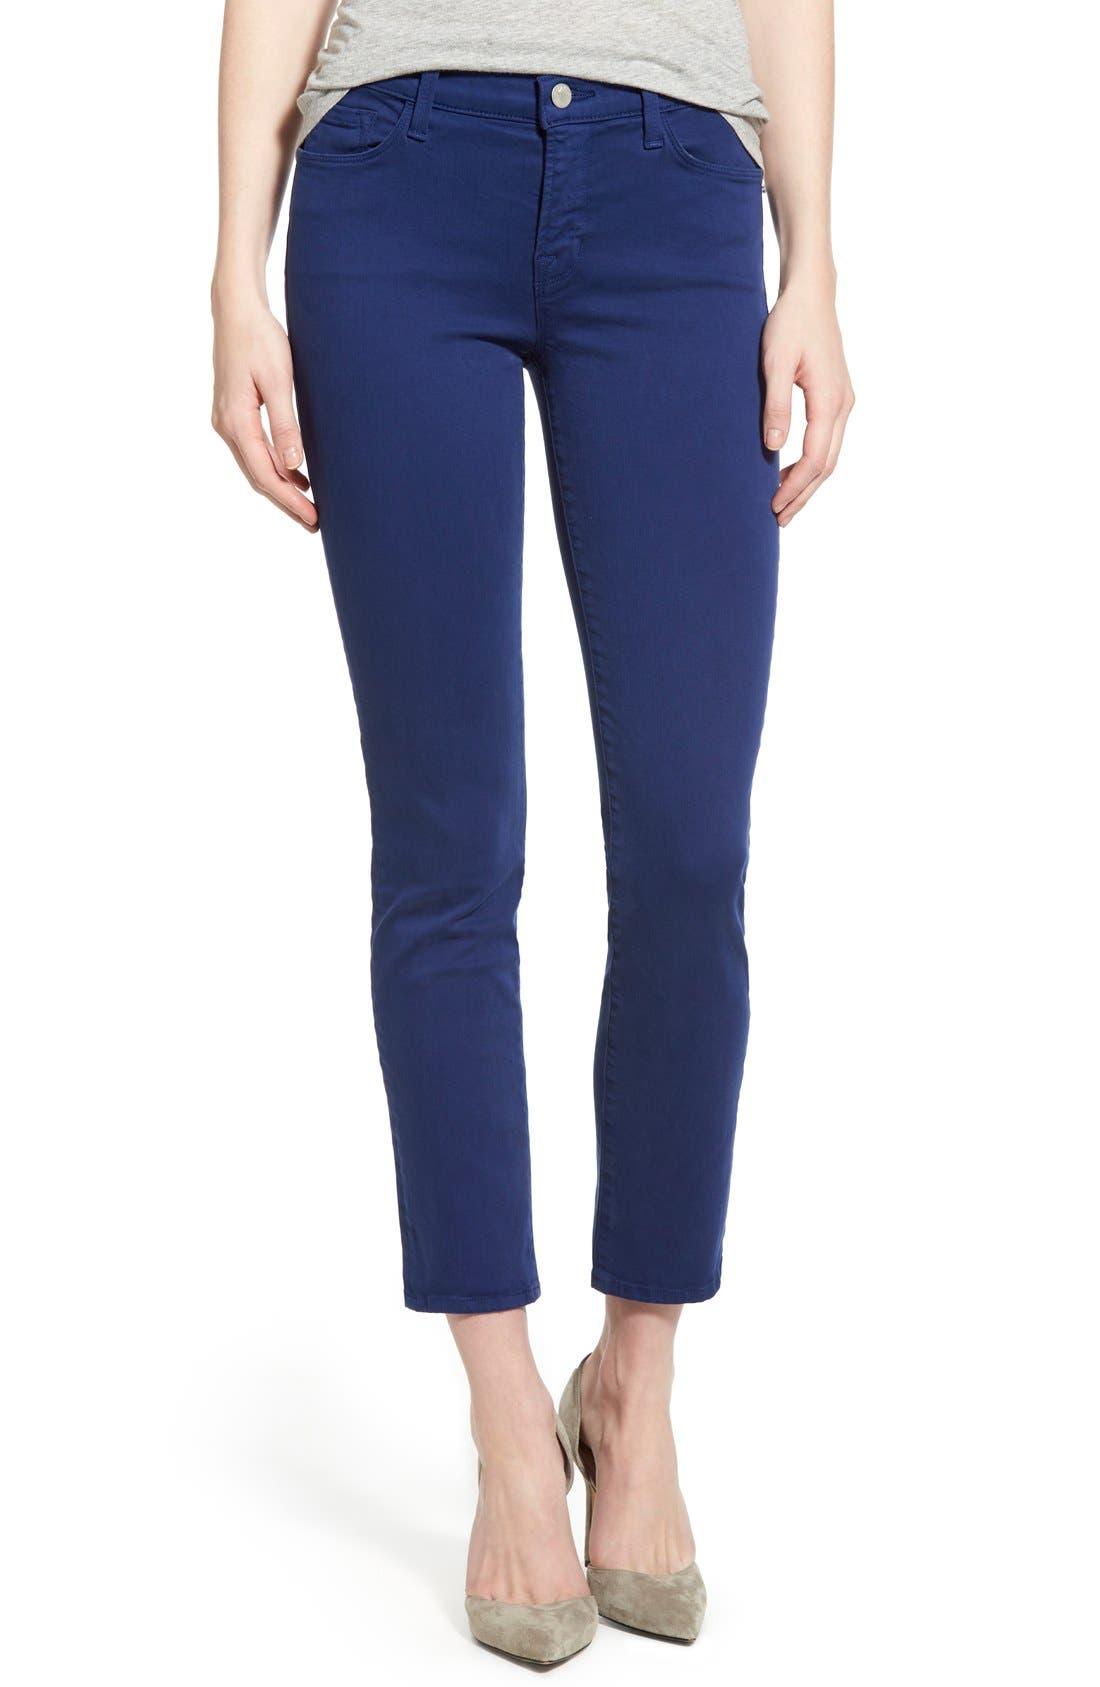 Alternate Image 1 Selected - J Brand 'Rail' Mid Rise Super Skinny Jeans